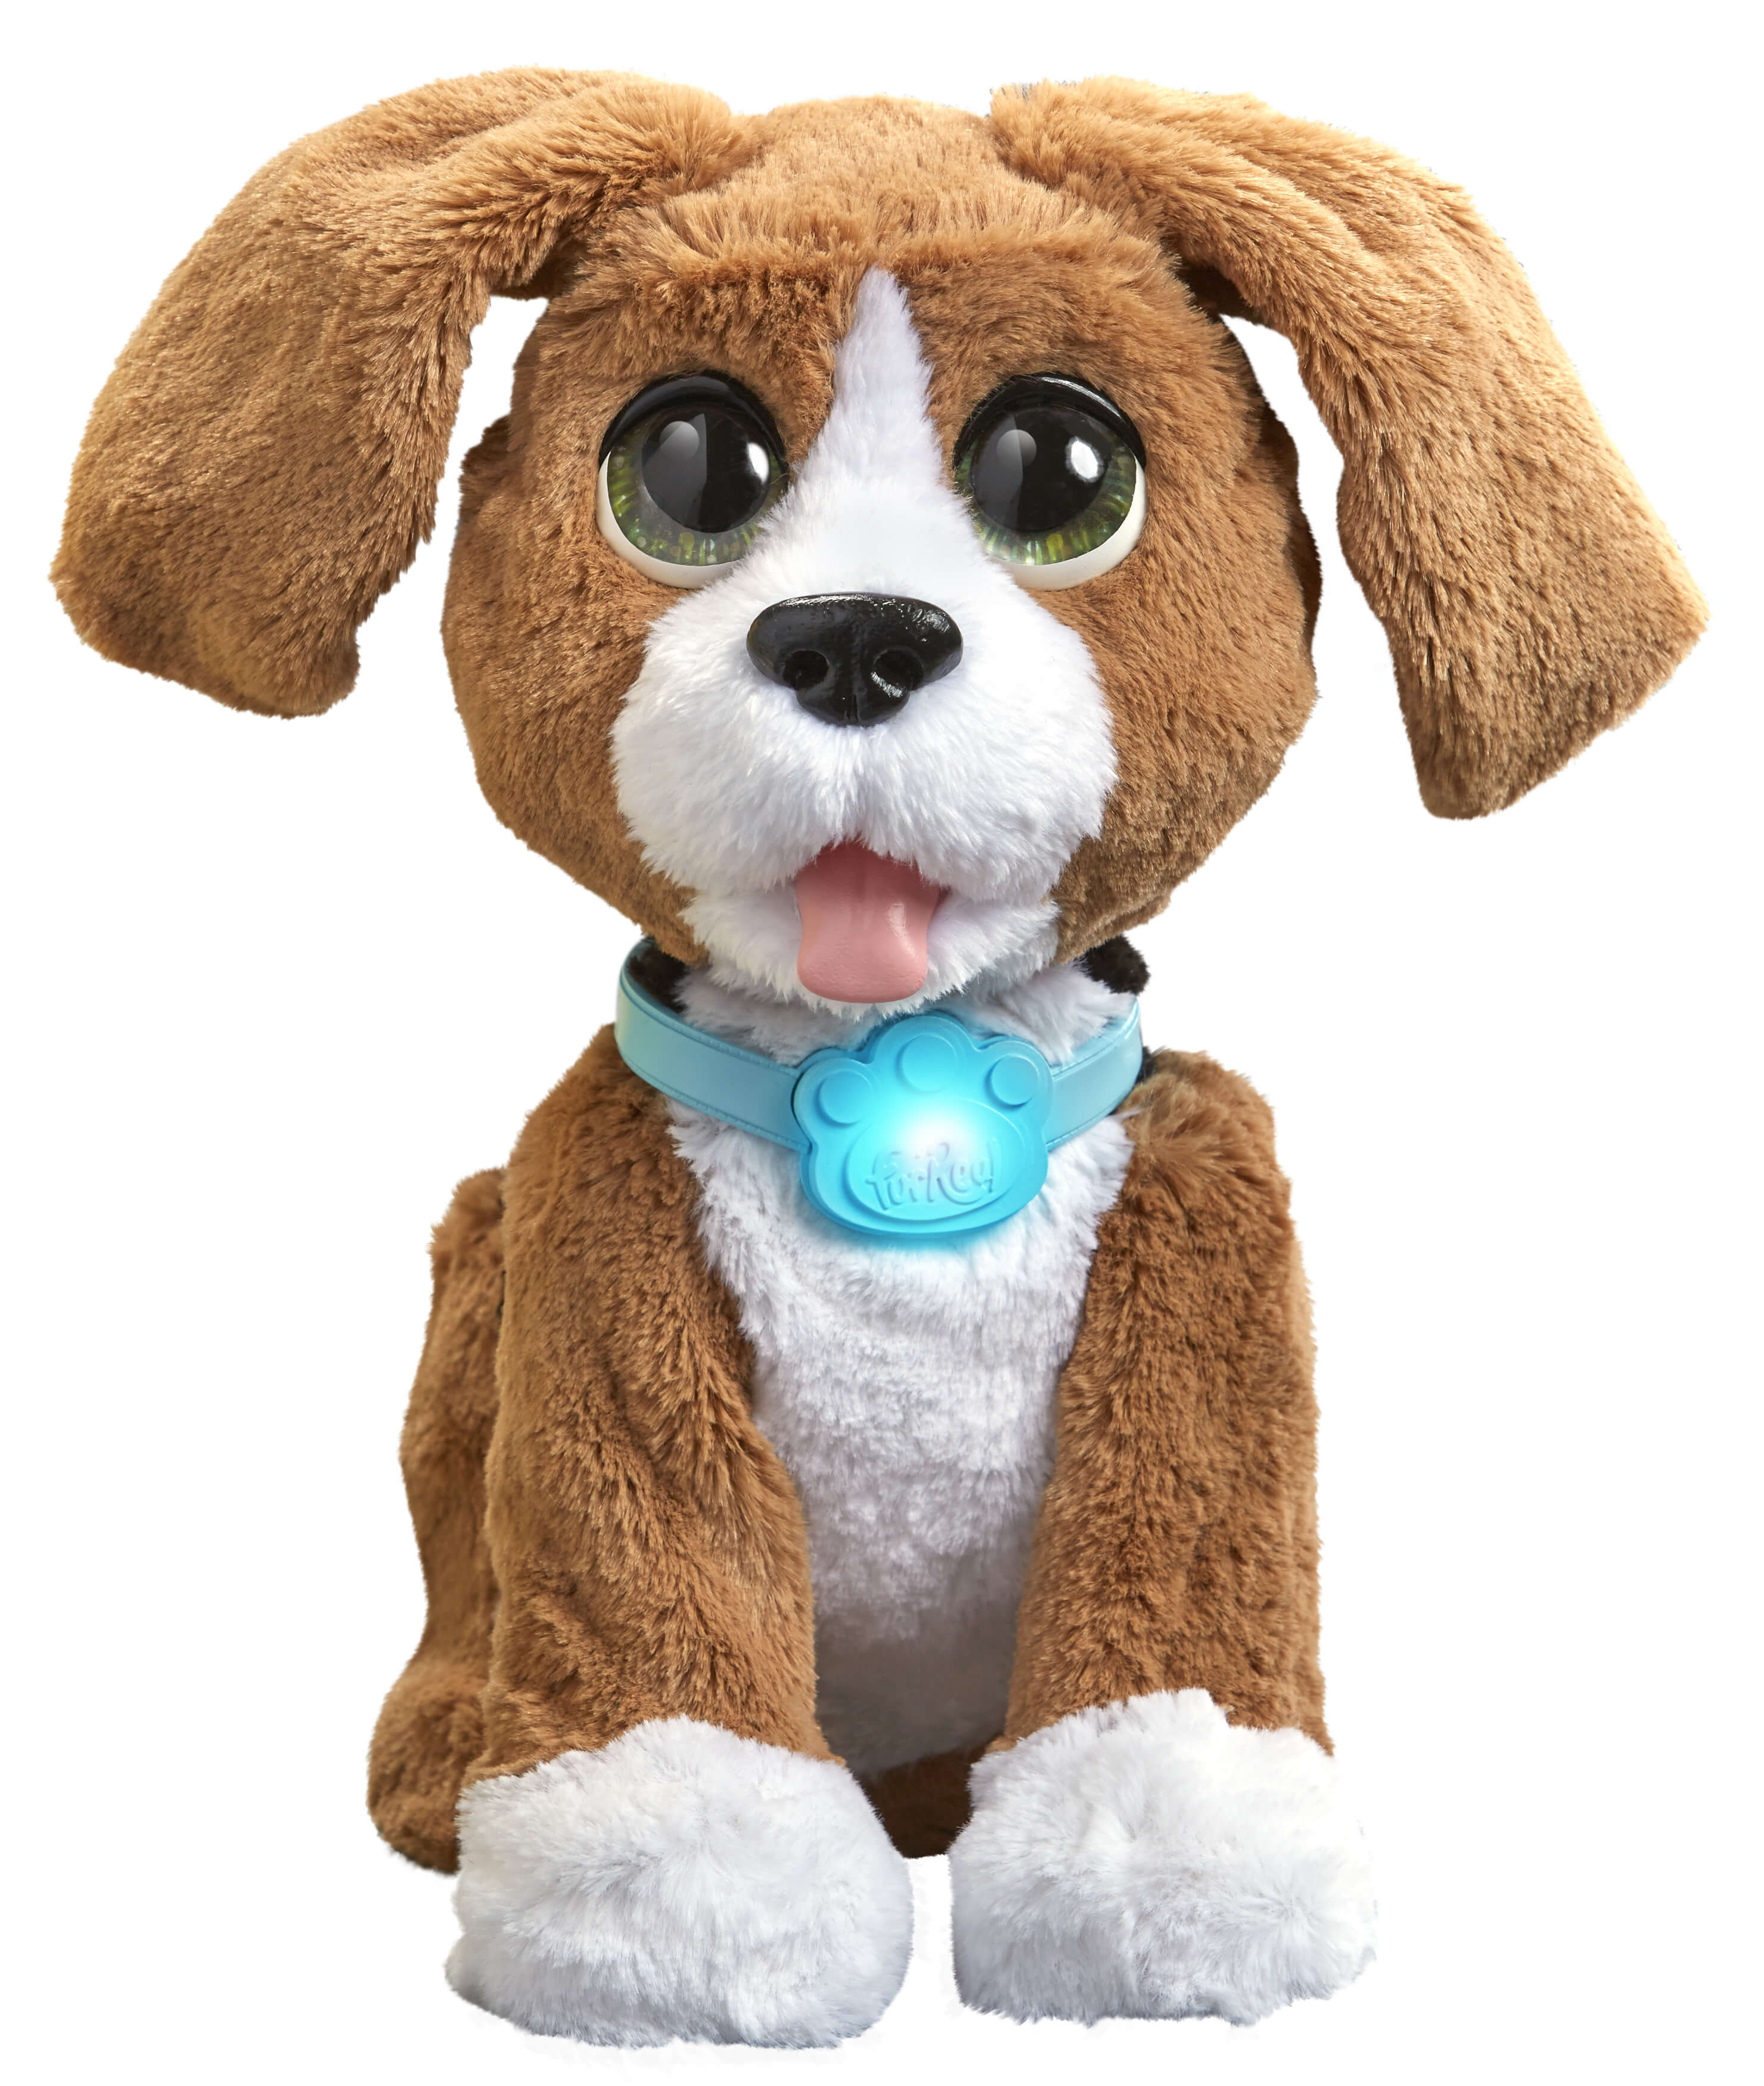 De hond van FurReal Friends Charlie als Sinterklaascadeau Lisette Schrijft